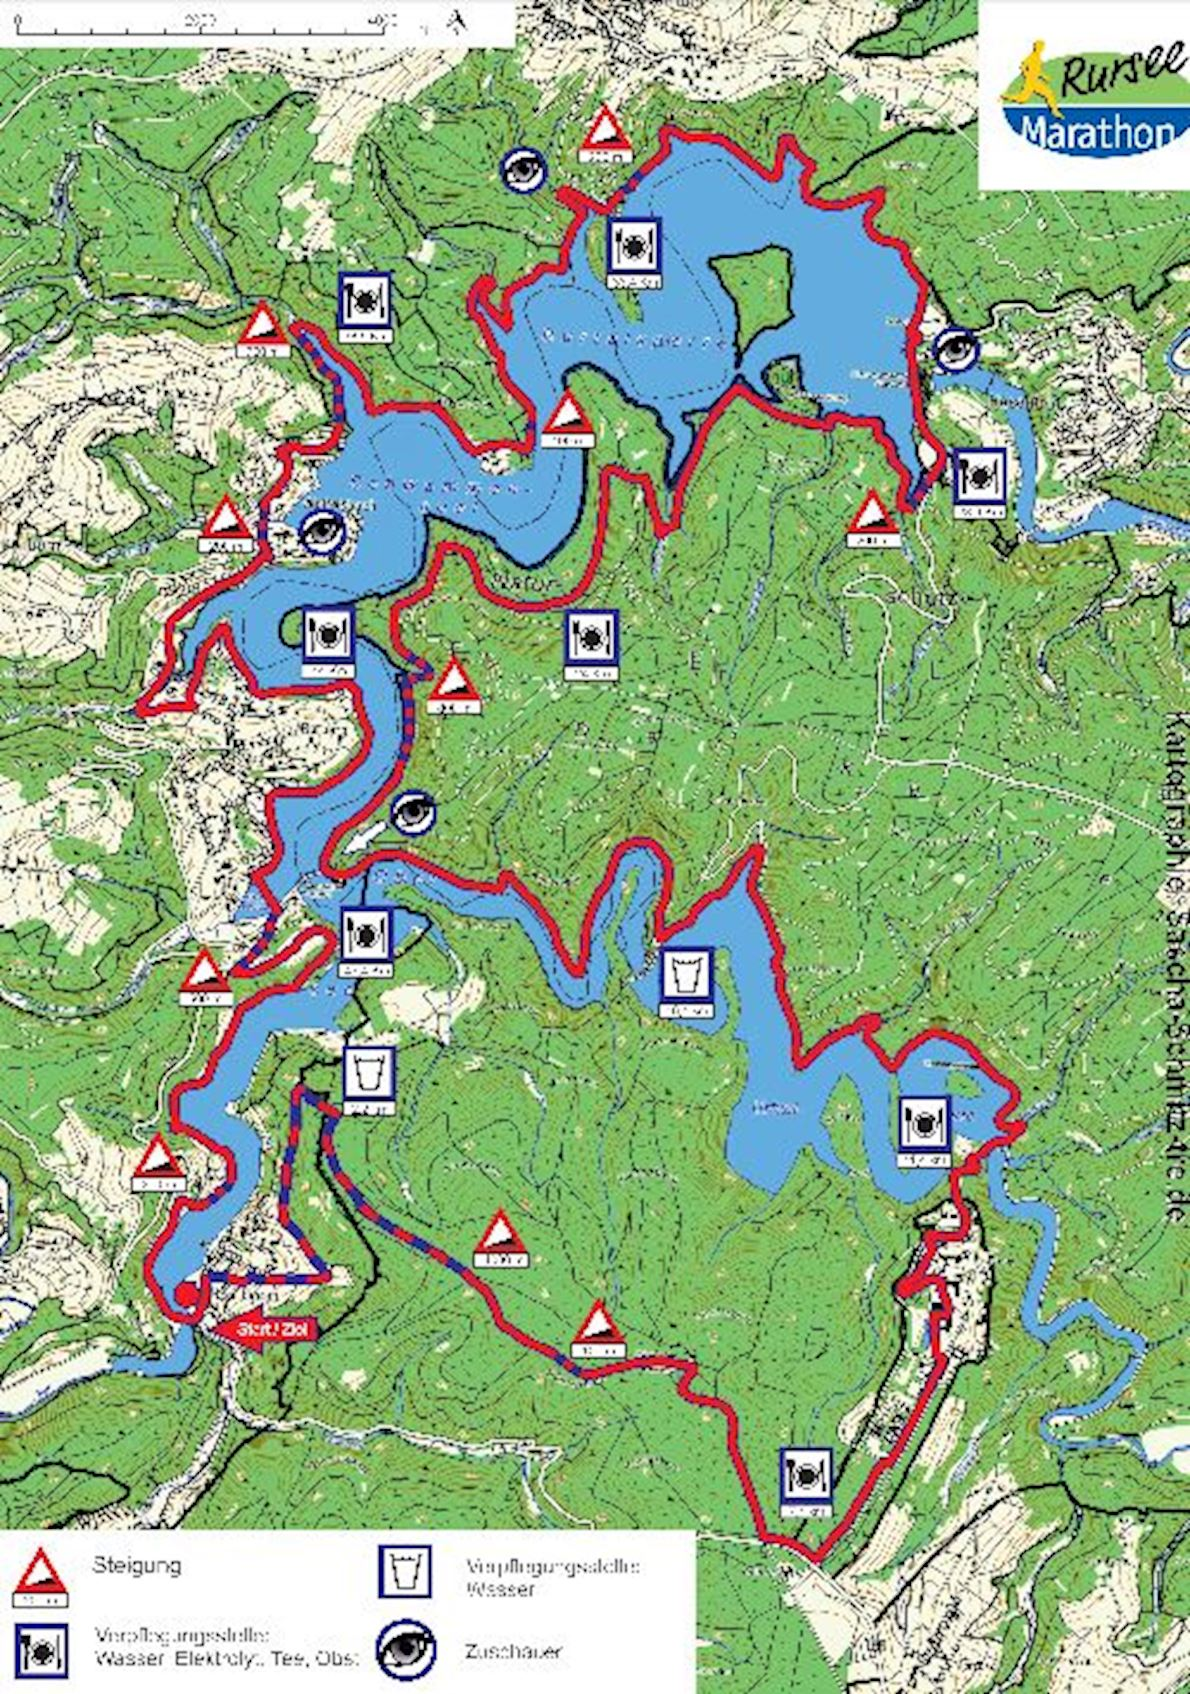 Rursee Marathon Routenkarte